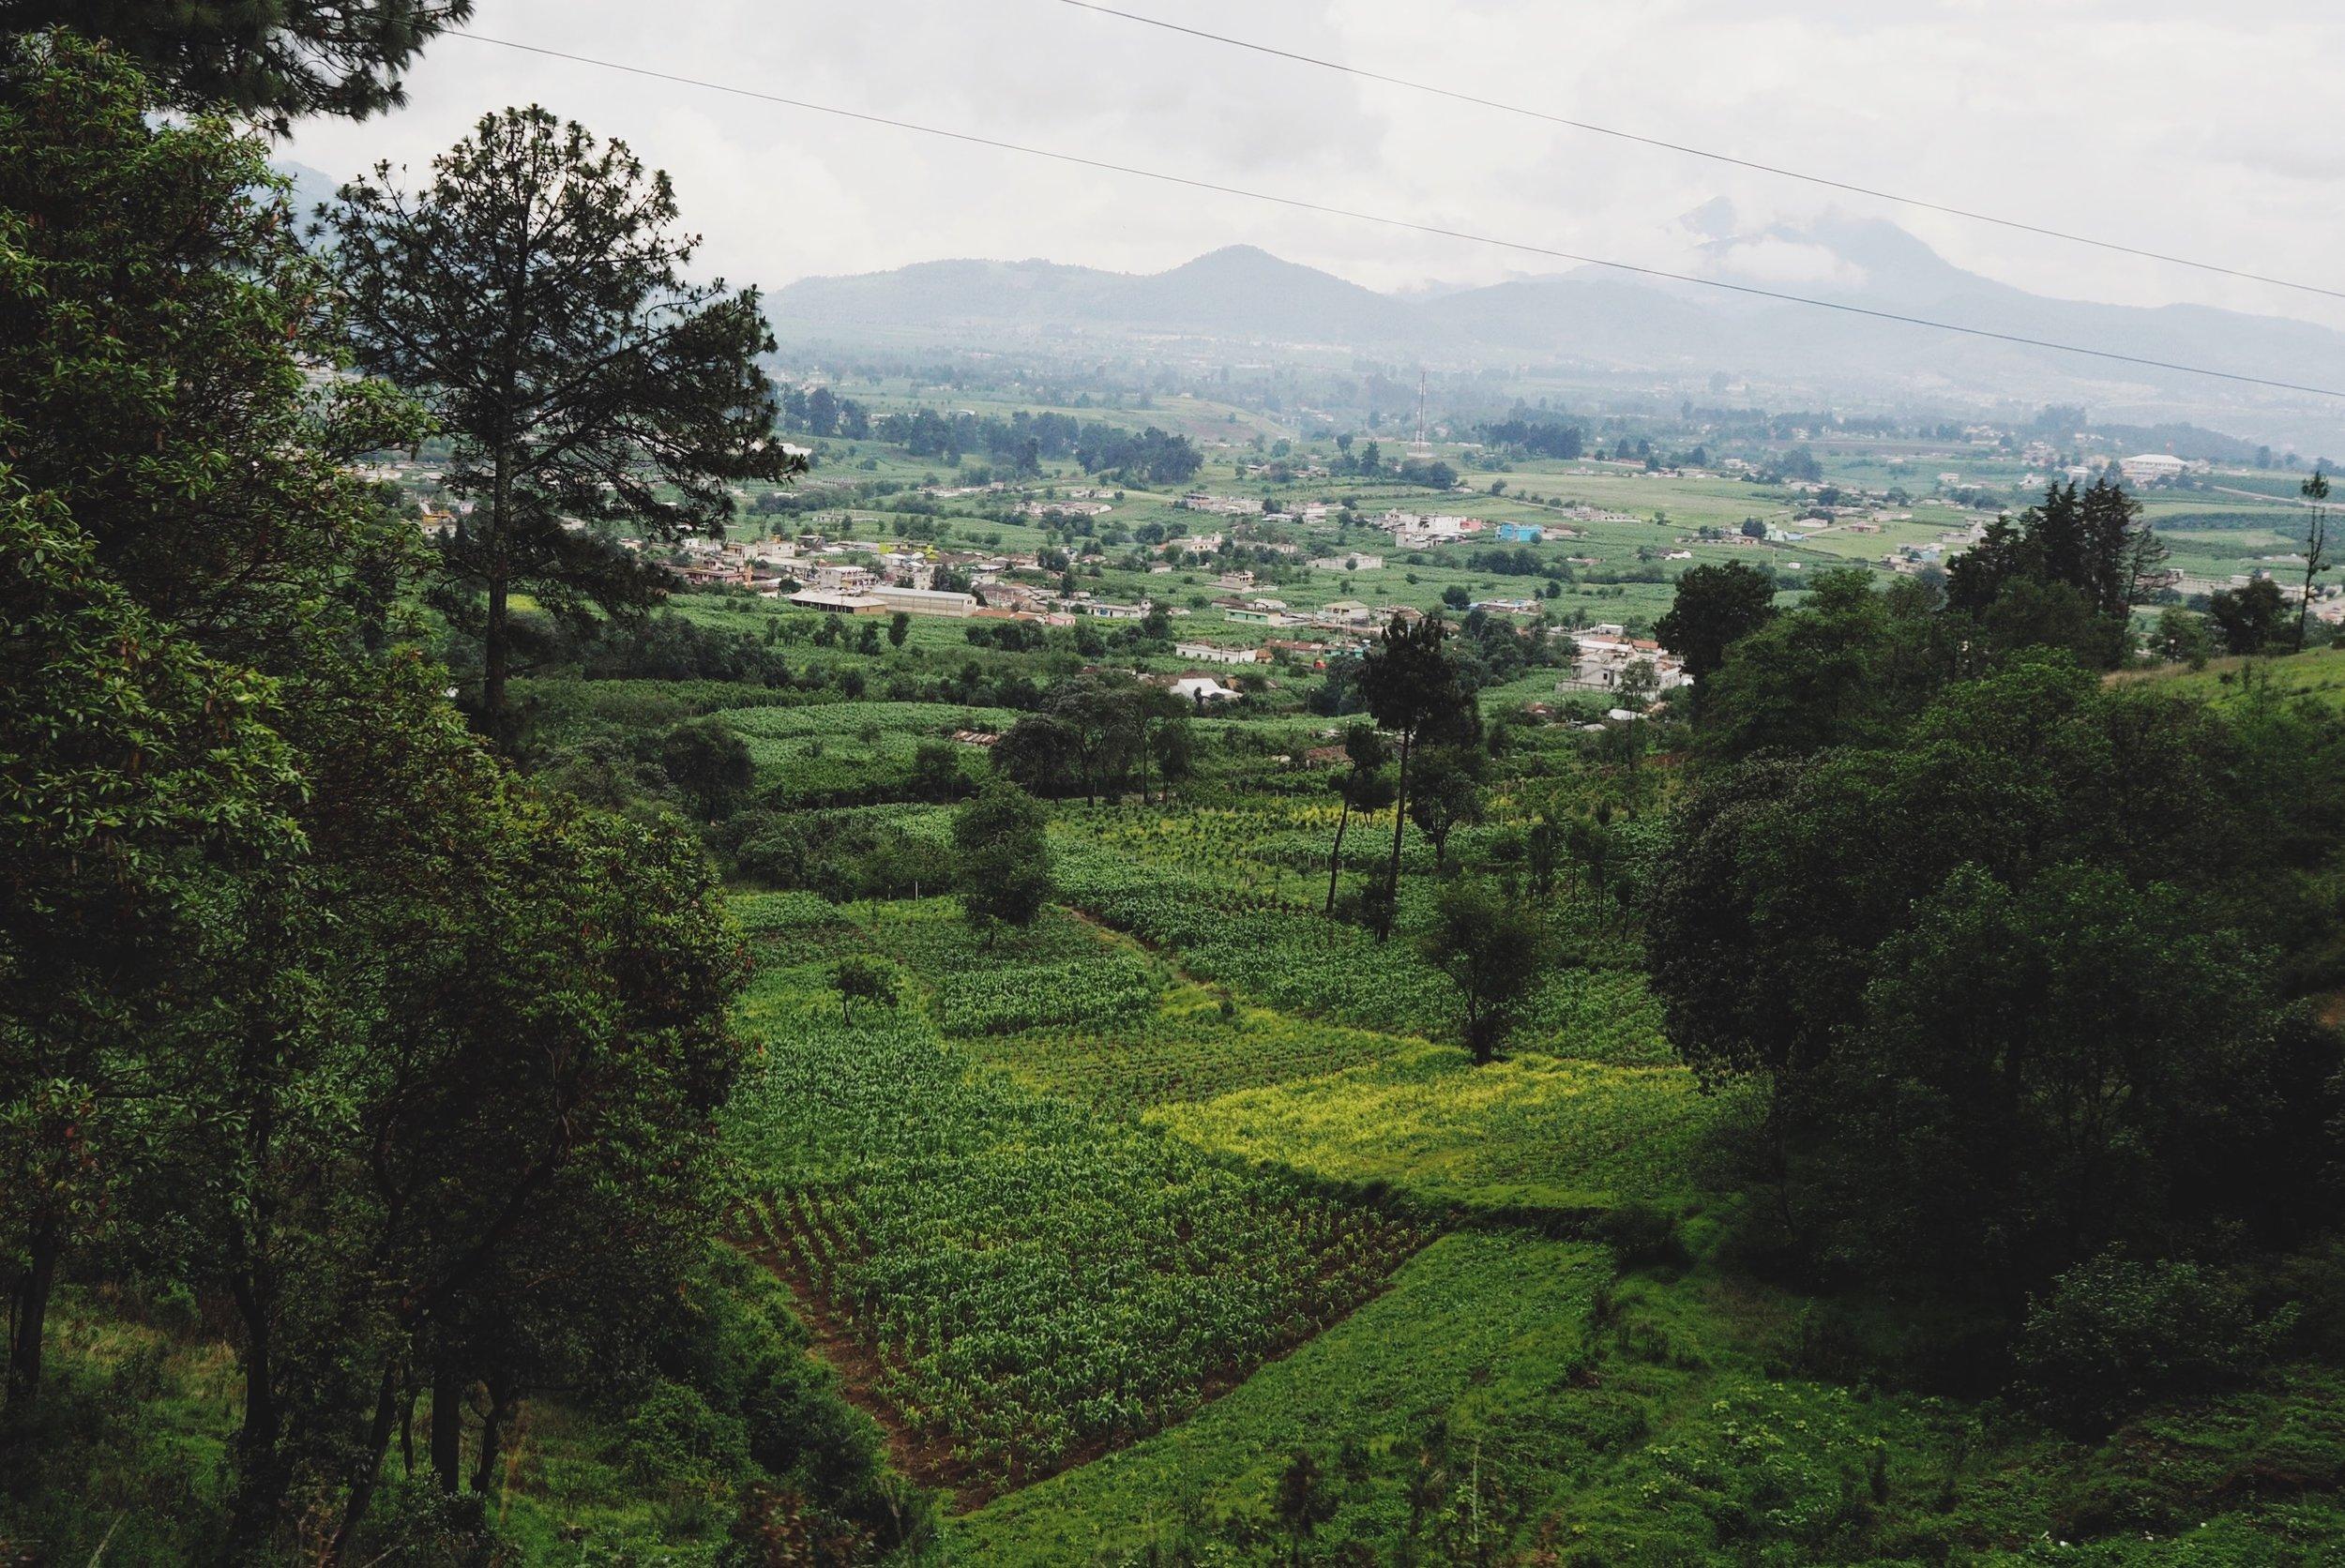 Guatemalan mountain scenery